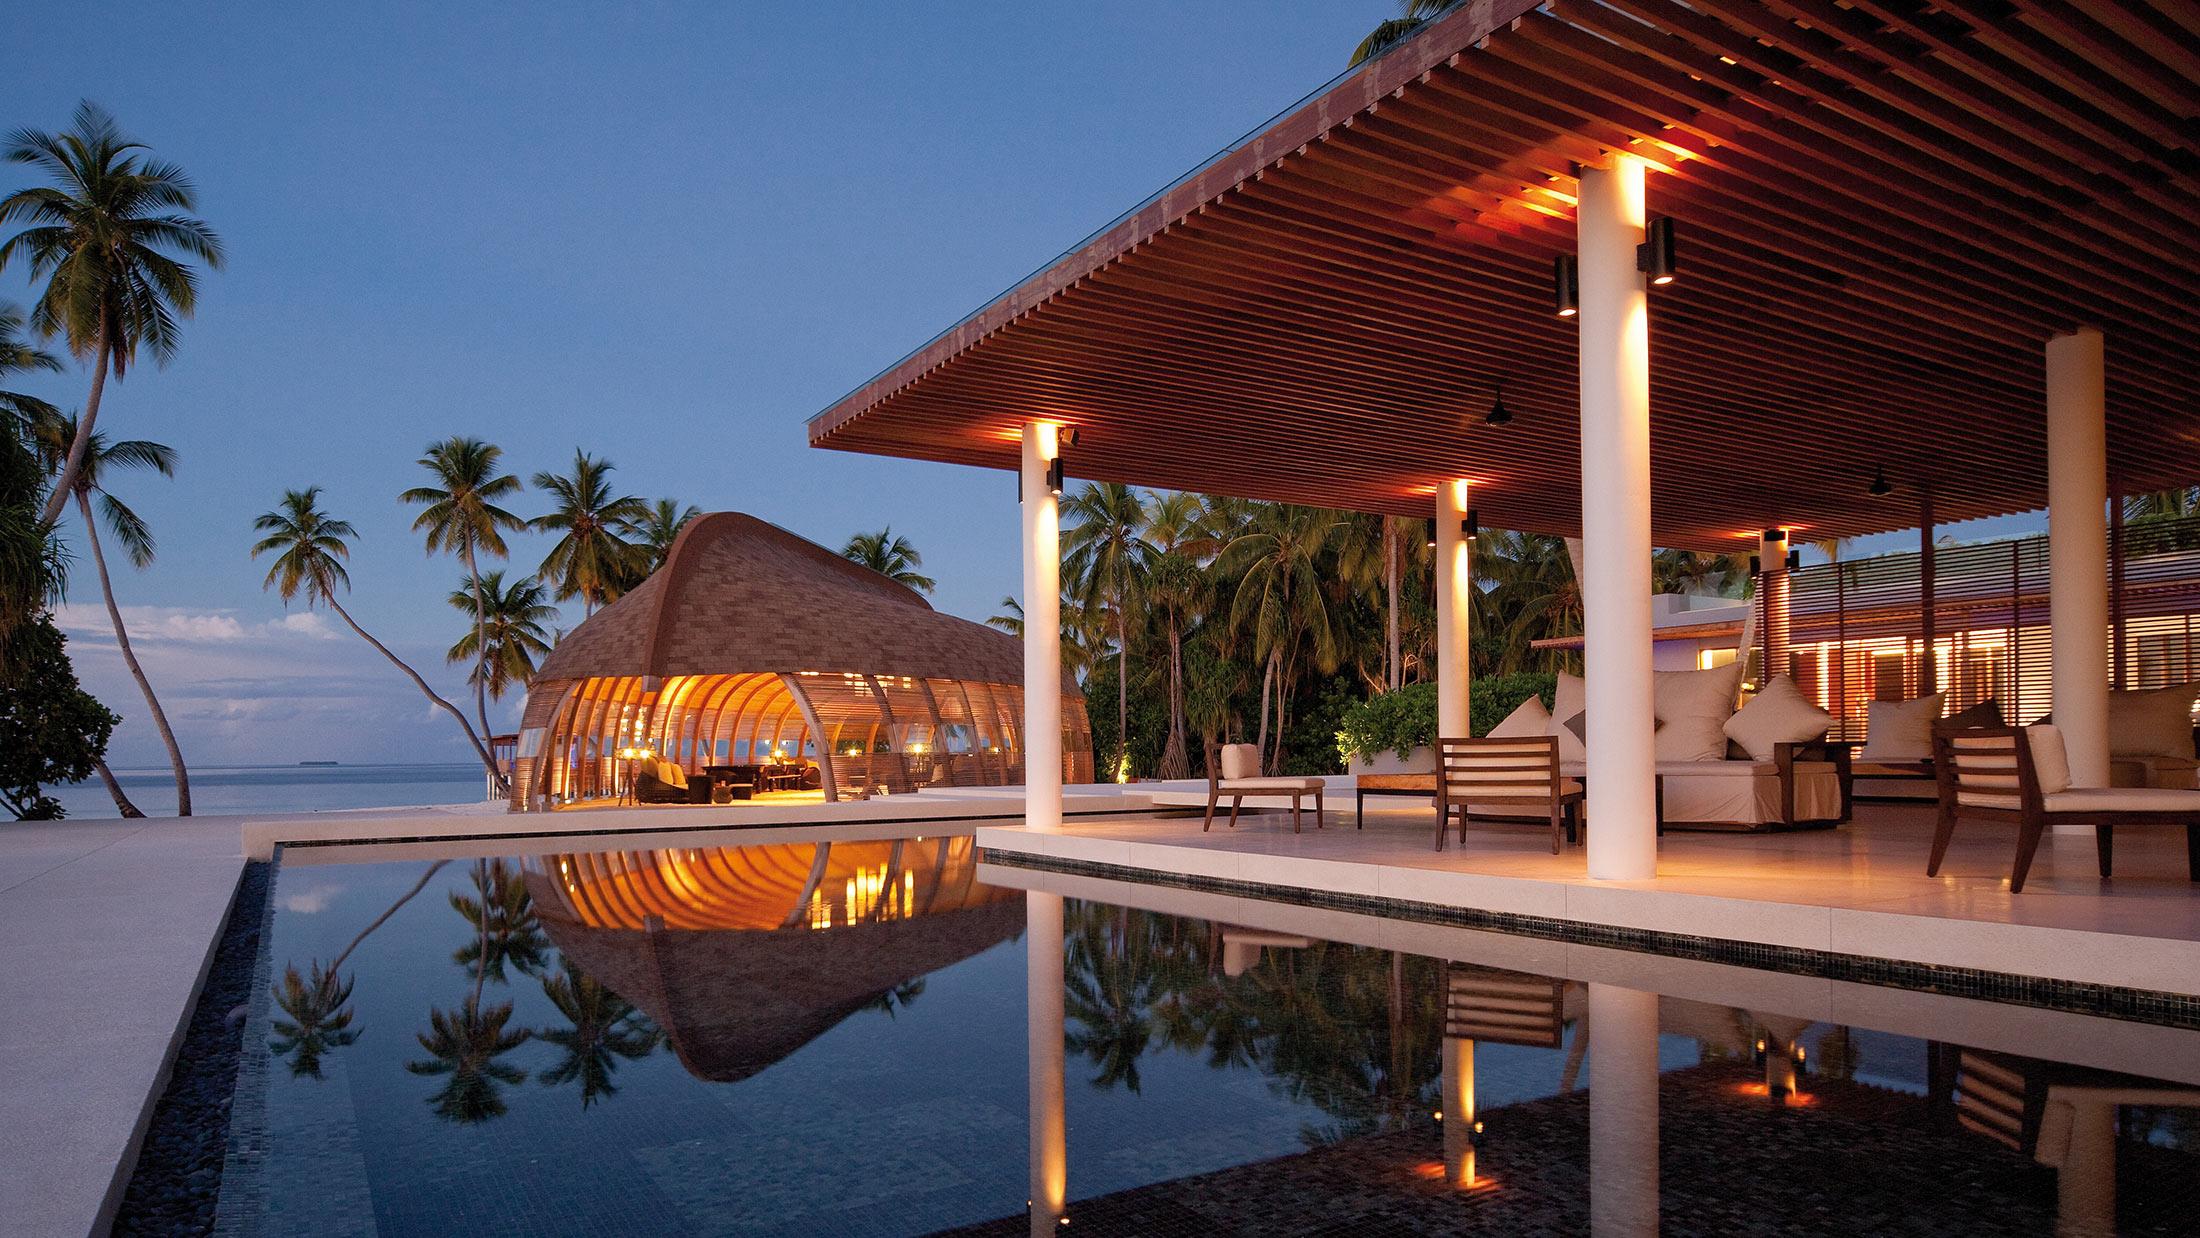 Park Hyatt Hadahaa - Gaafu Alifu Atoll, Maldives